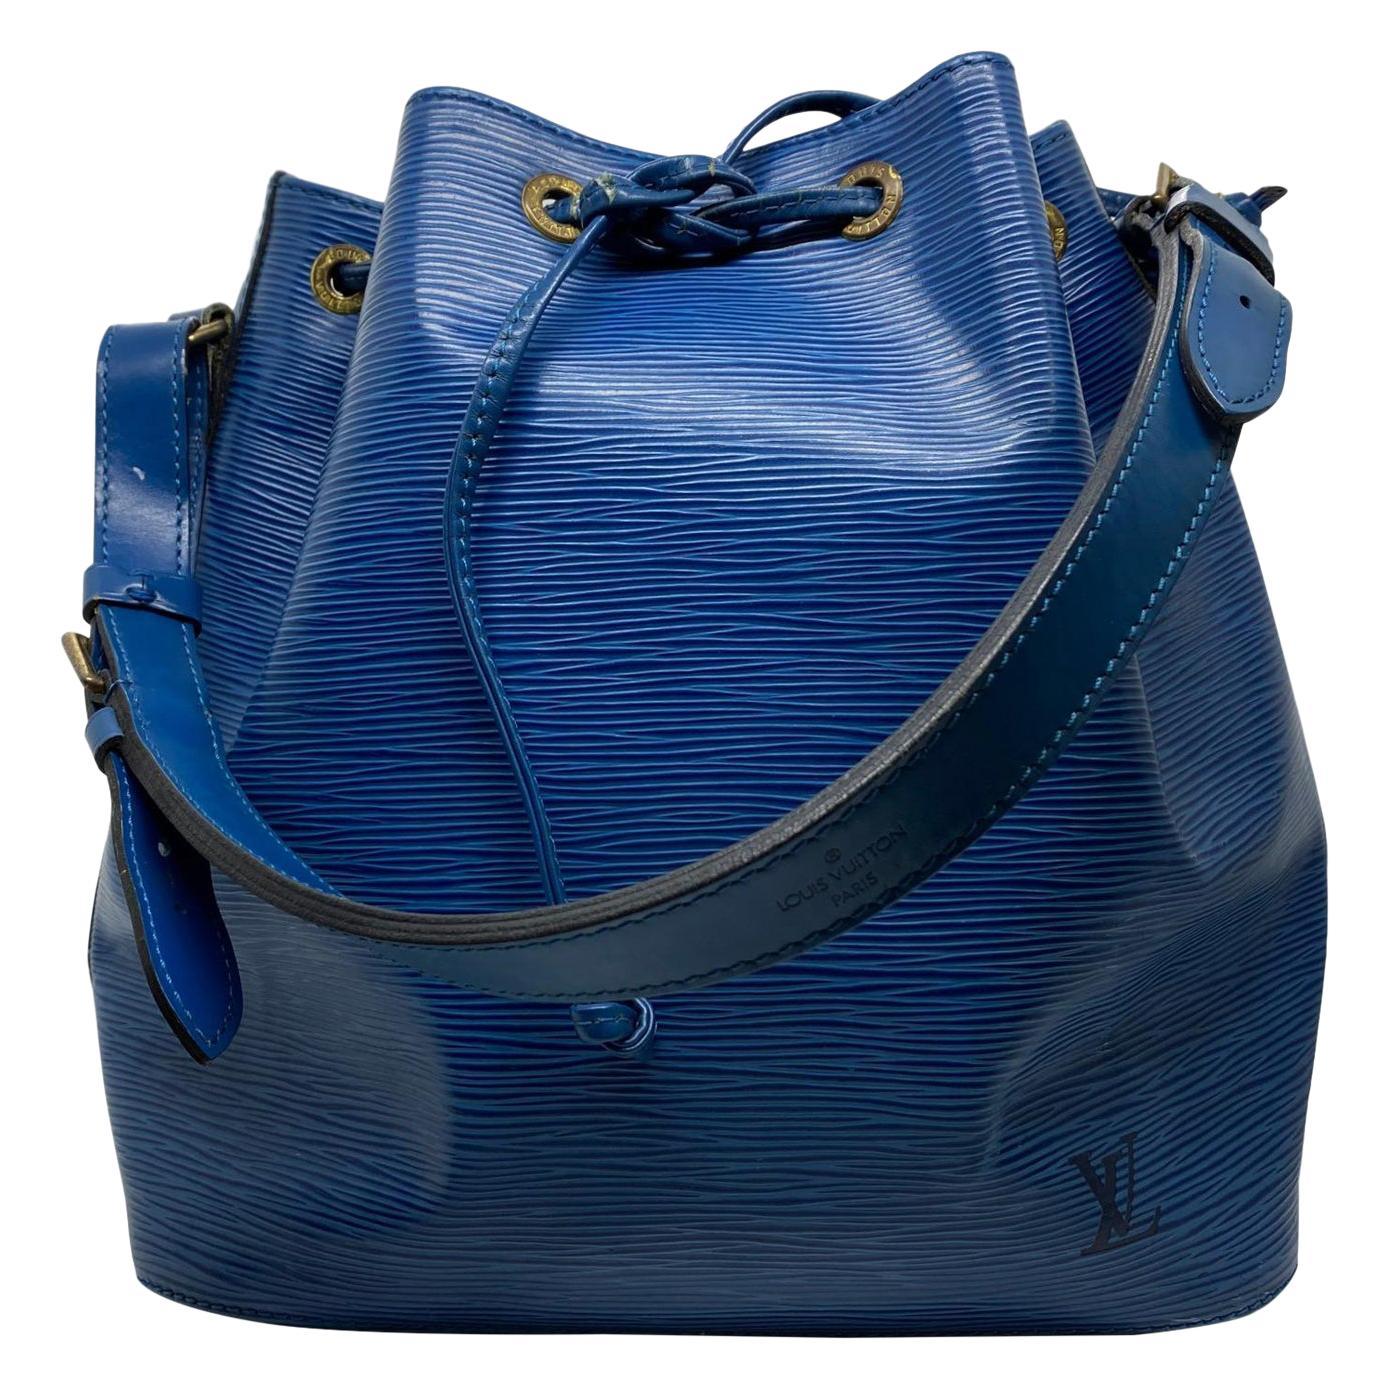 Louis Vuitton Noe PM Toledo Blue EPI Leather Bucket Bag, France 1992.